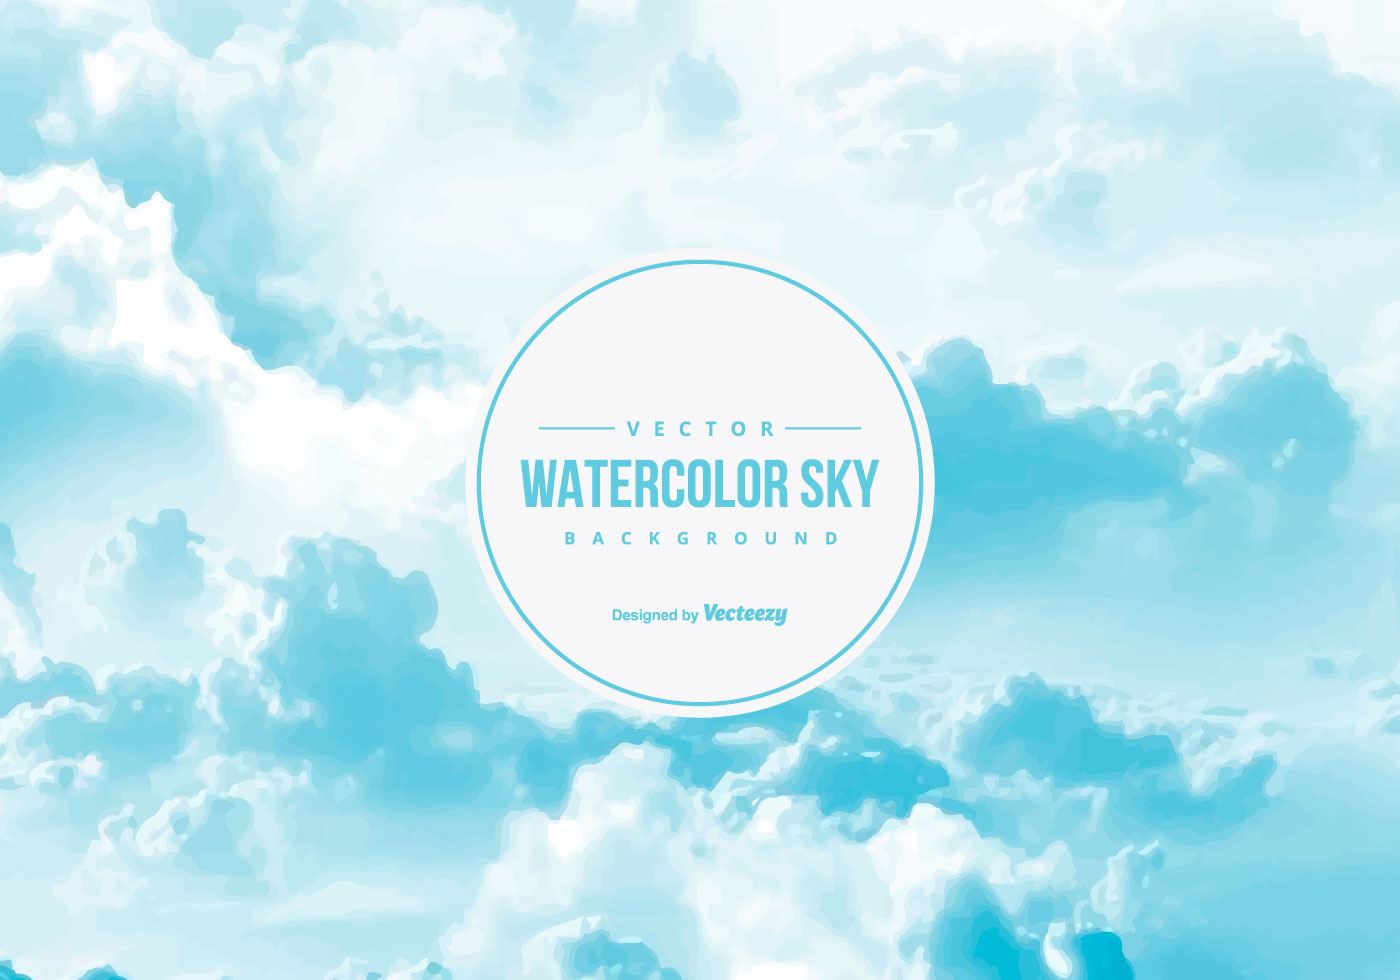 bd7c0473bb0d Watercolor Sky Background - Download Free Vector Art, Stock Graphics ...